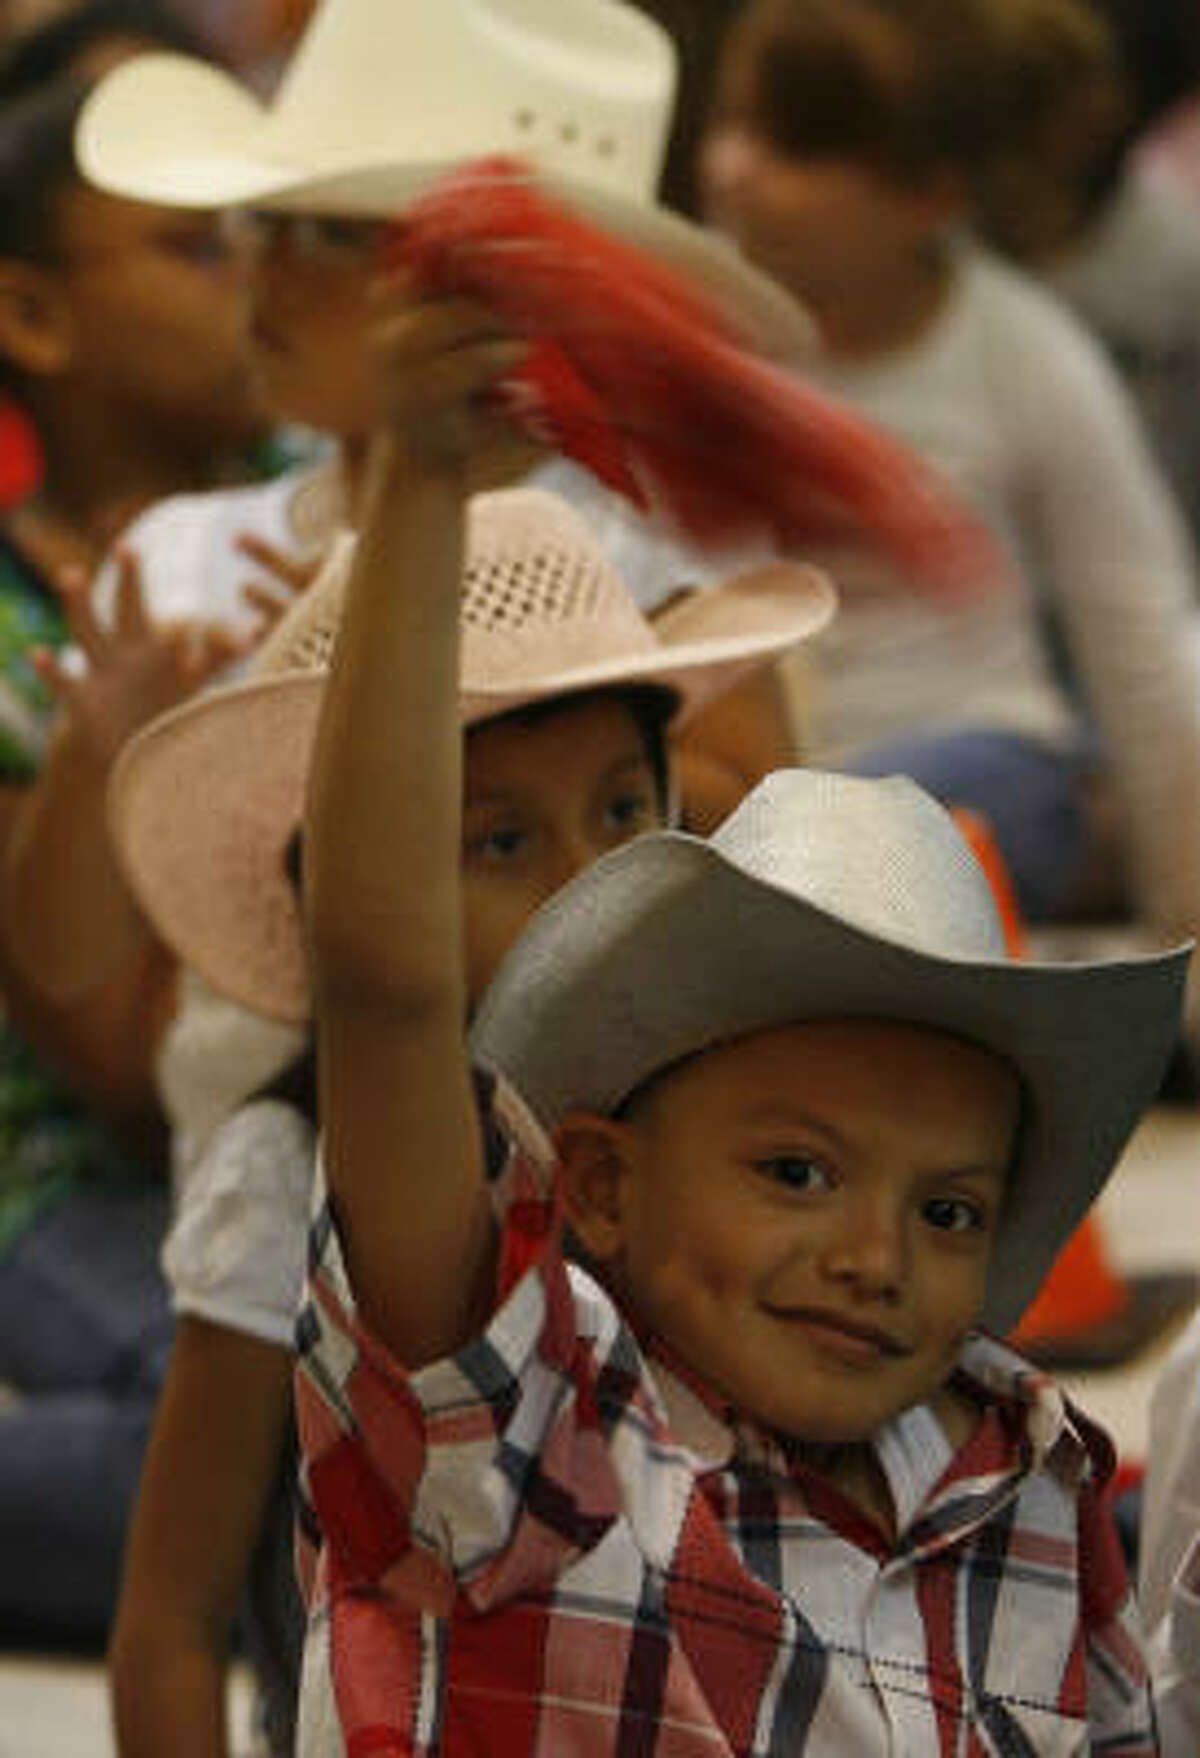 Marlo Alvarado cheers for the mariachis in Texas City.